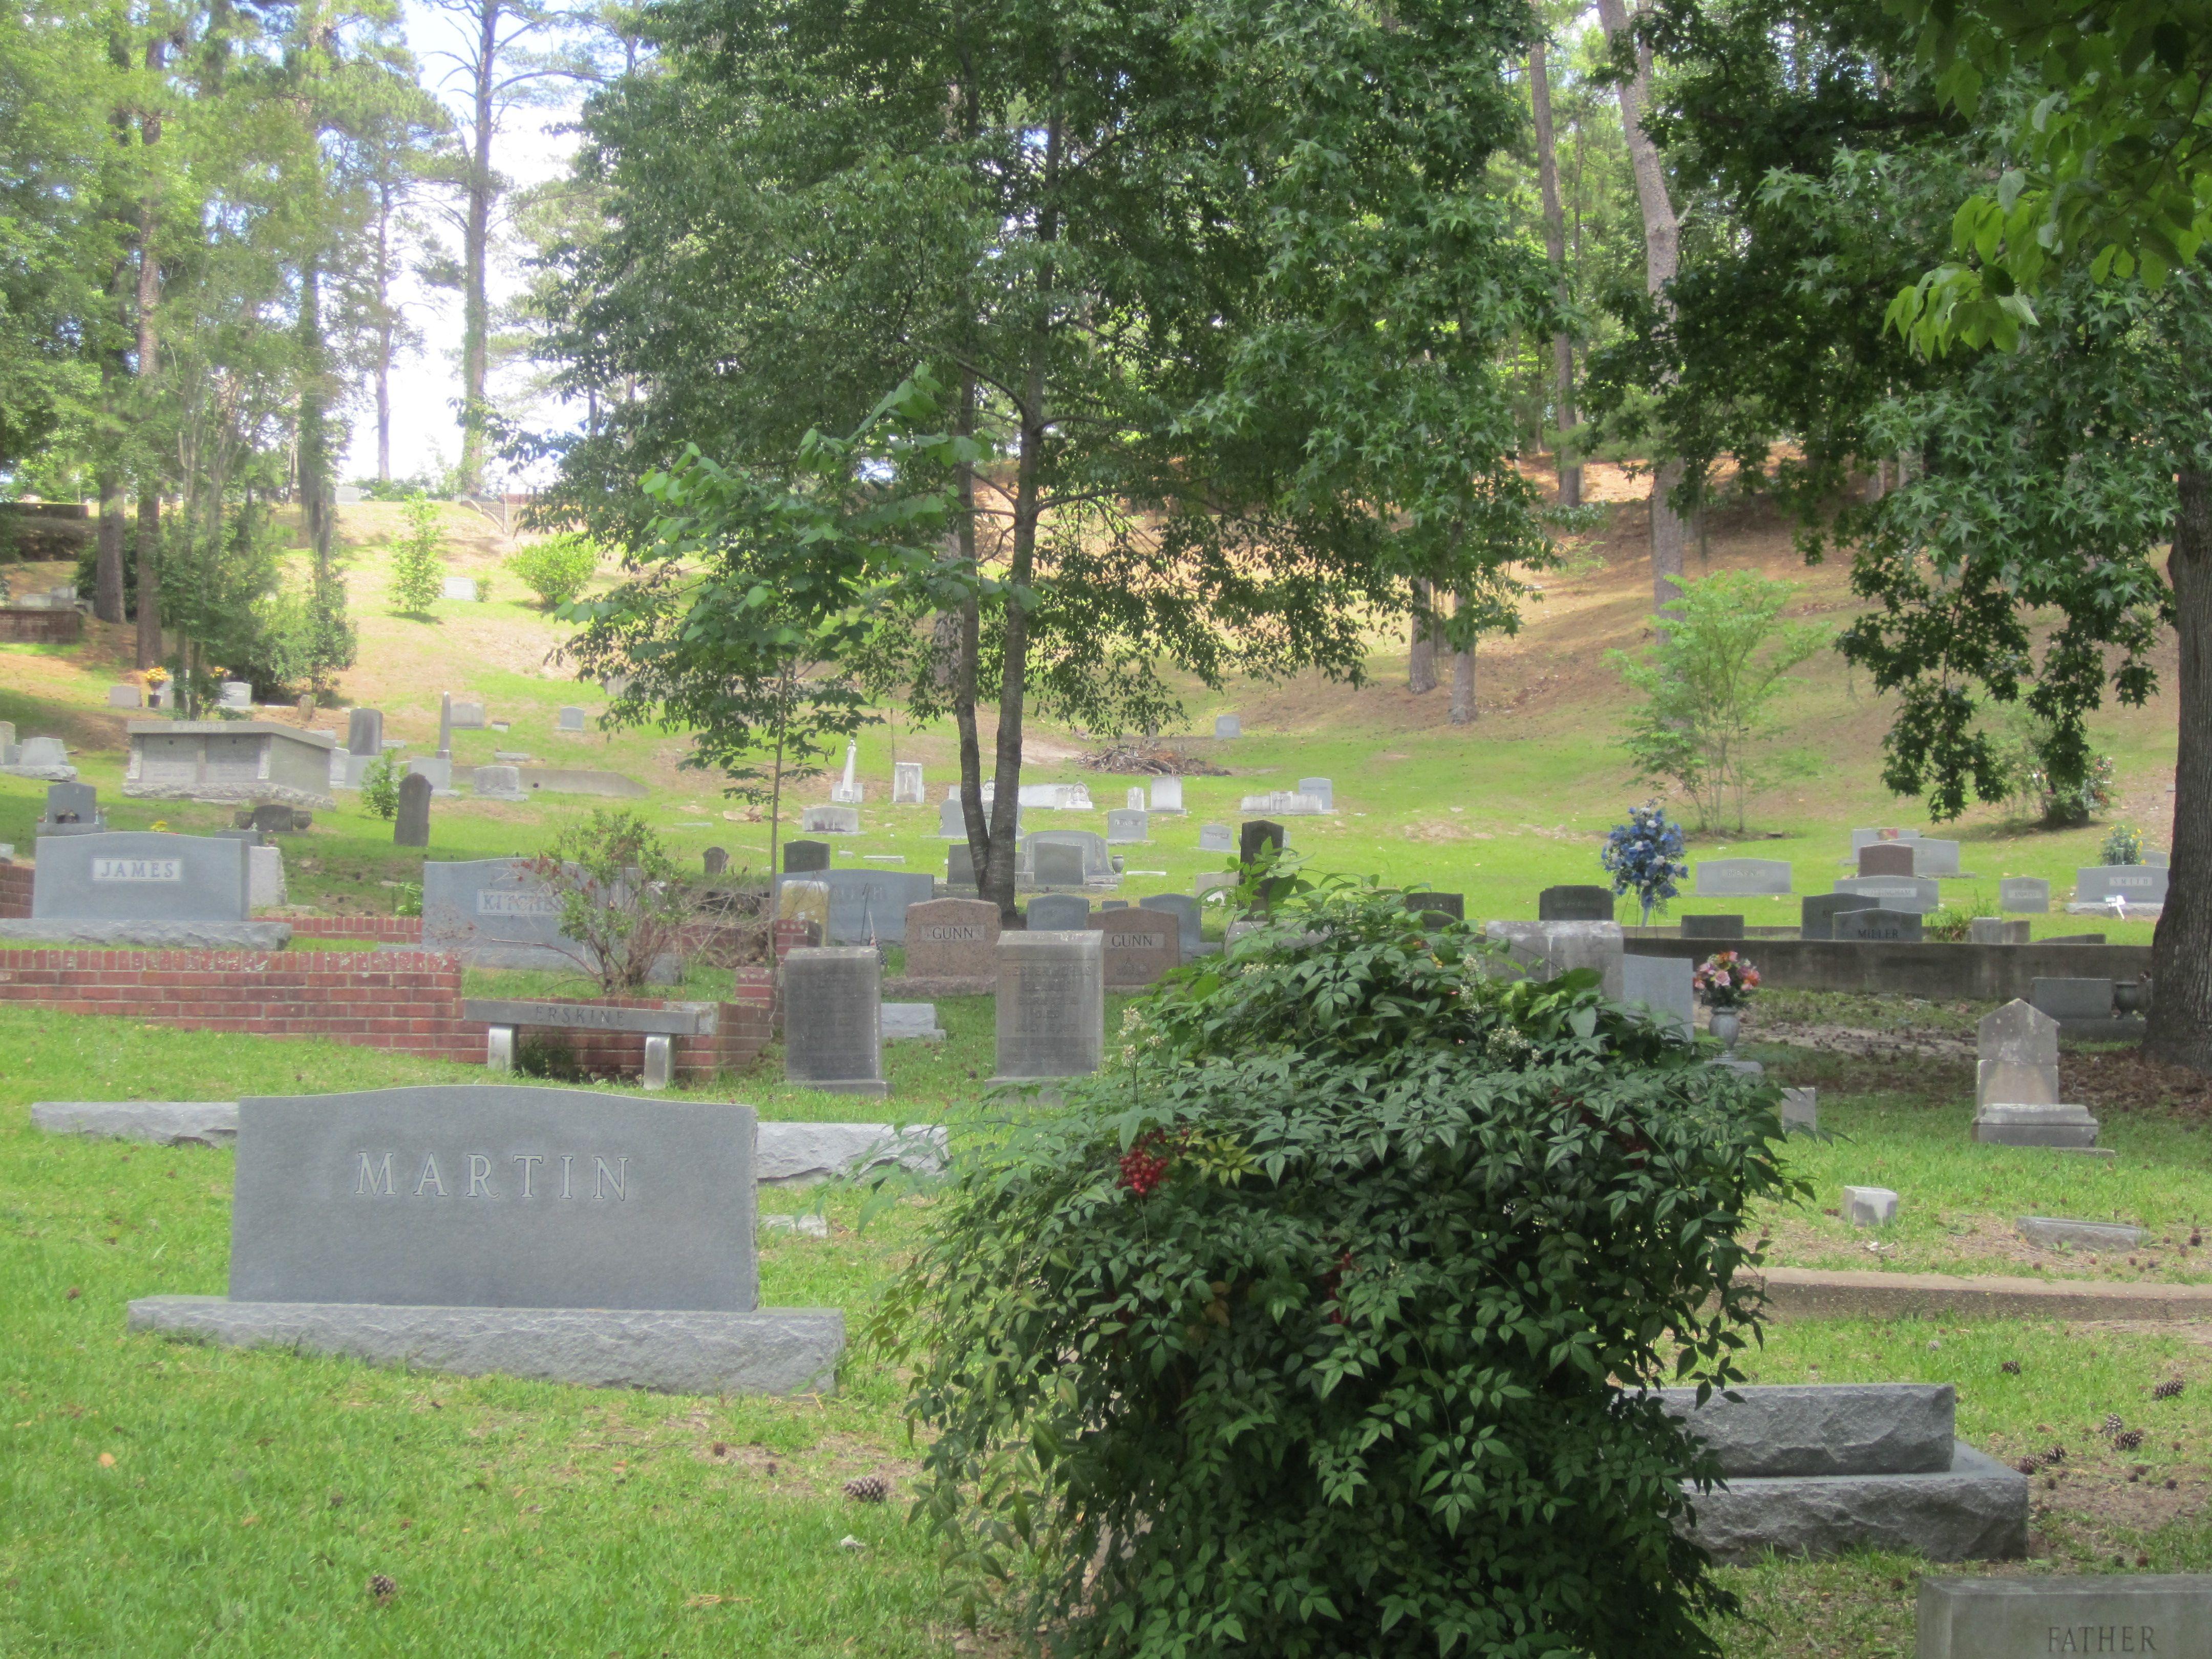 73b8b64c452414b256dcaec70ac7135f - Southern Memorial Gardens Cemetery Baton Rouge